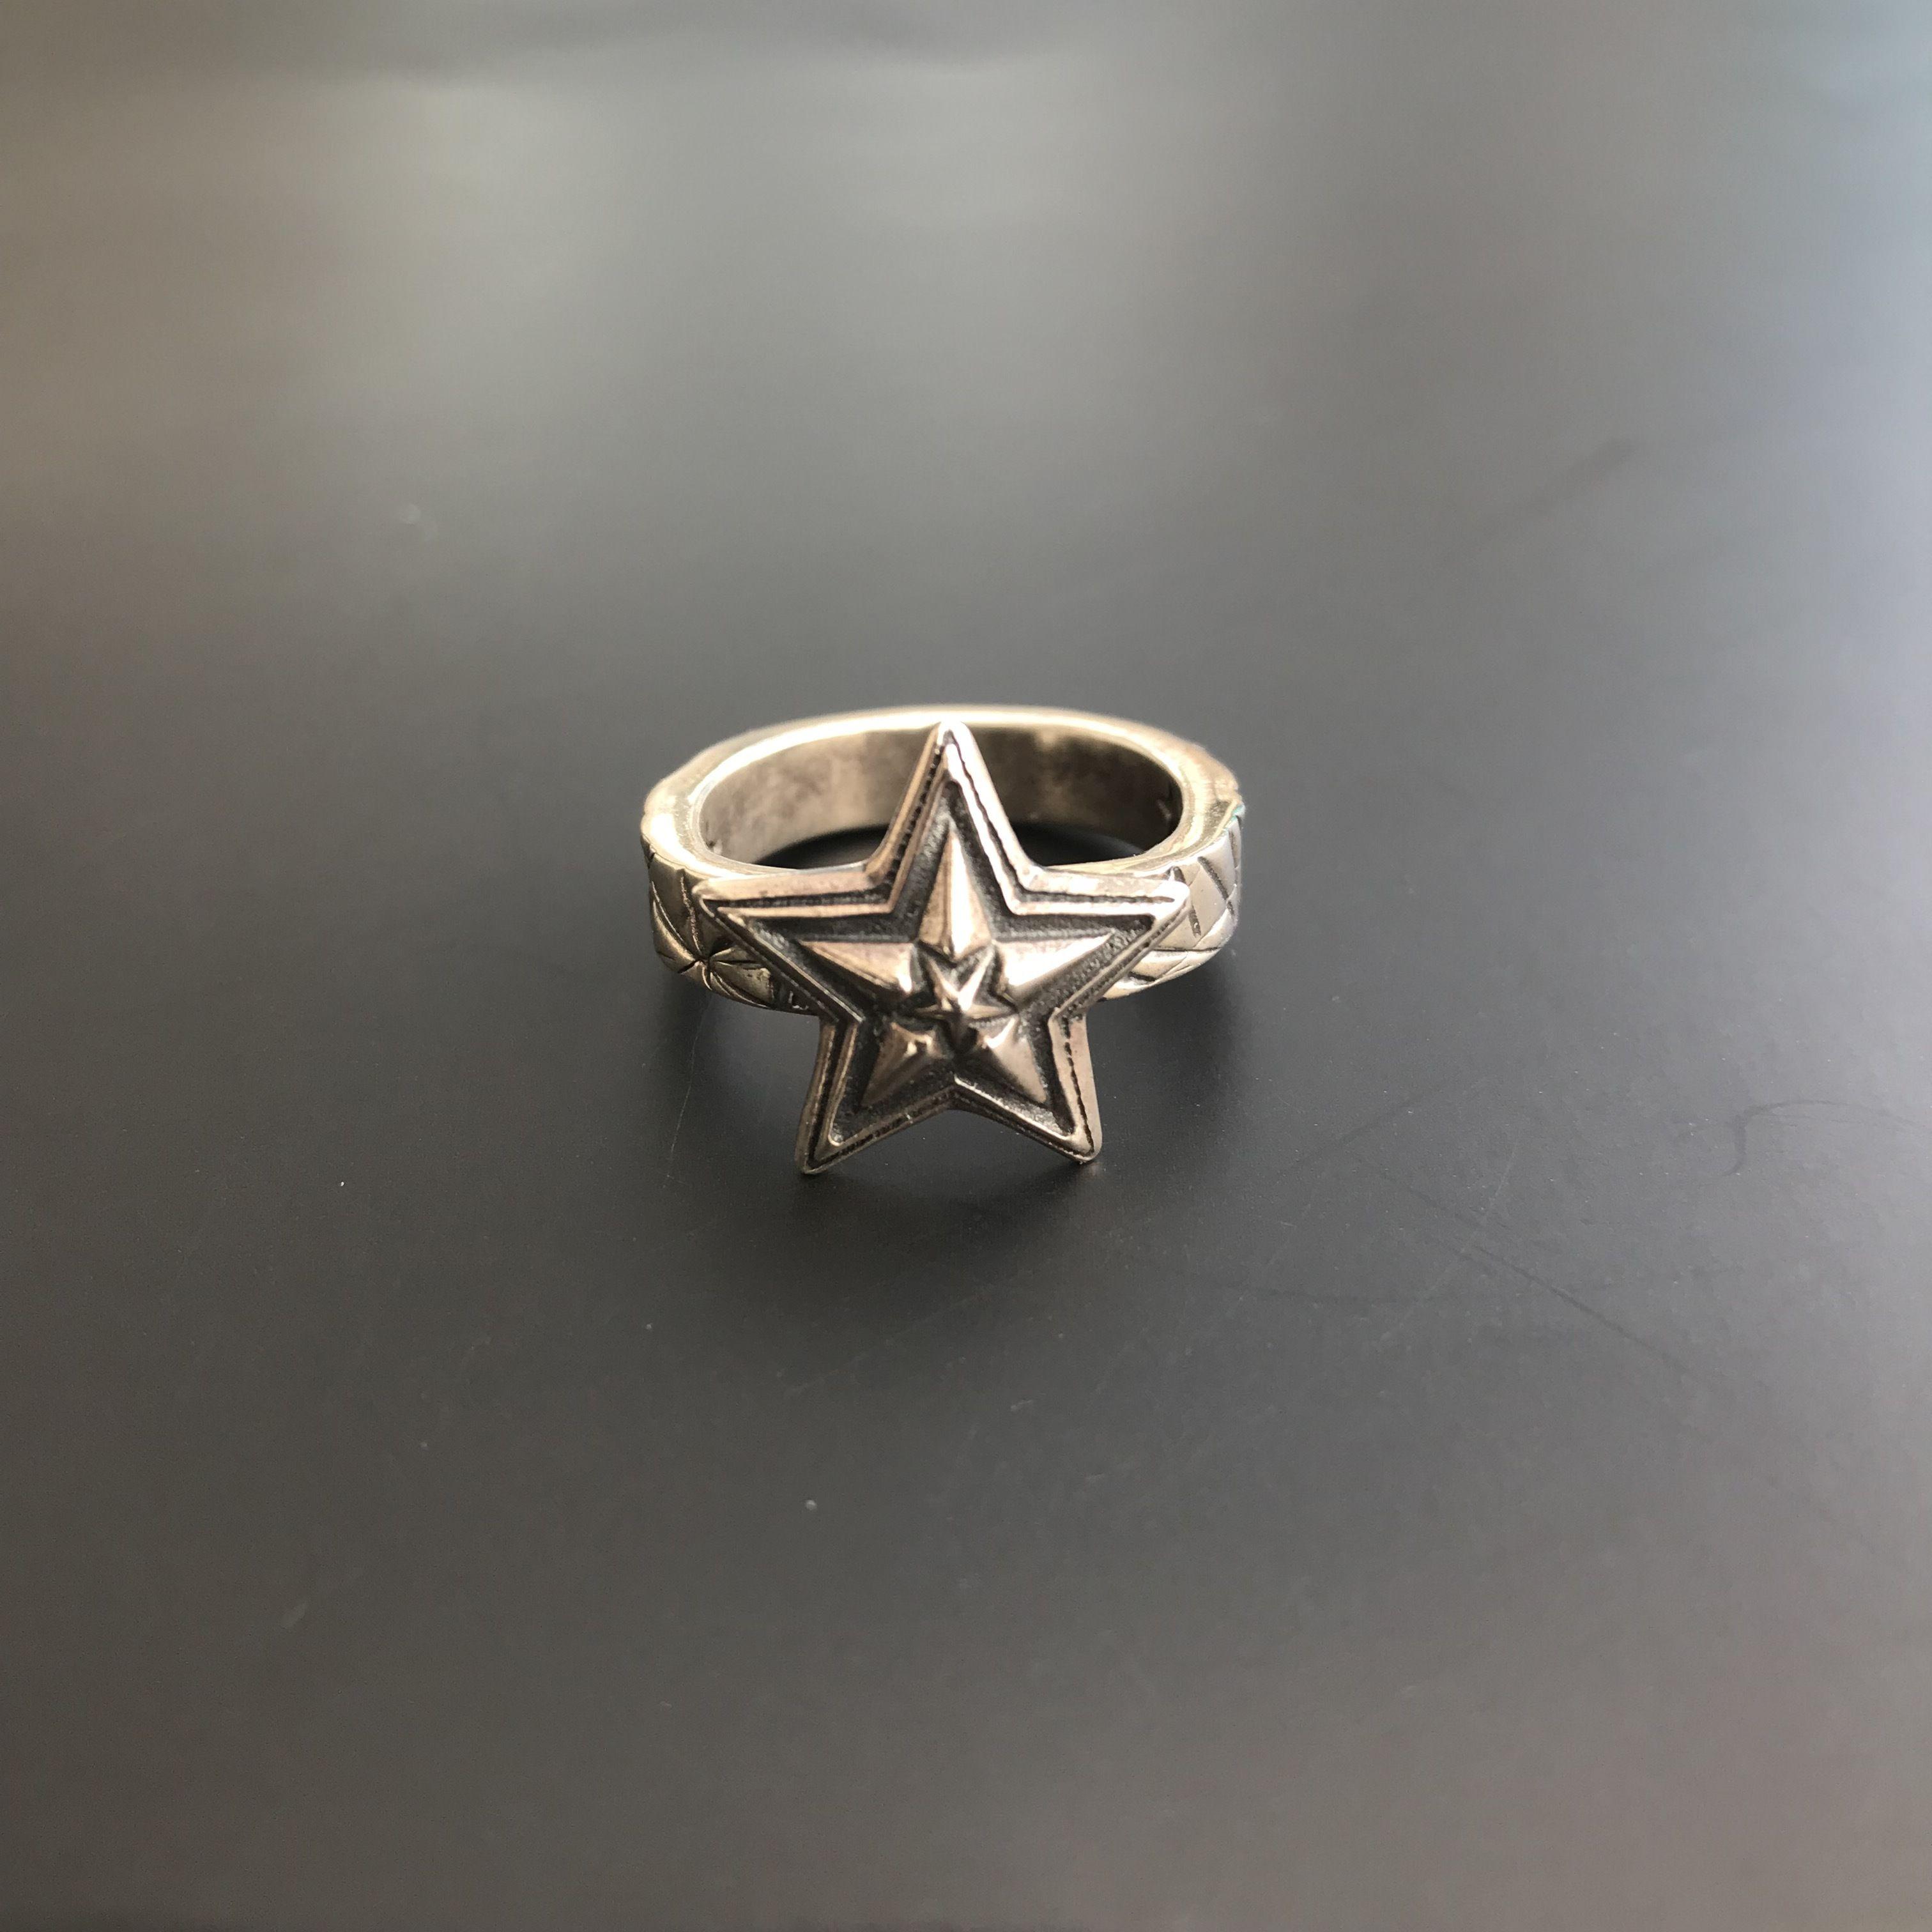 CODY SANDERSON - Ring Tiny Star In Star w/Cat Scratch